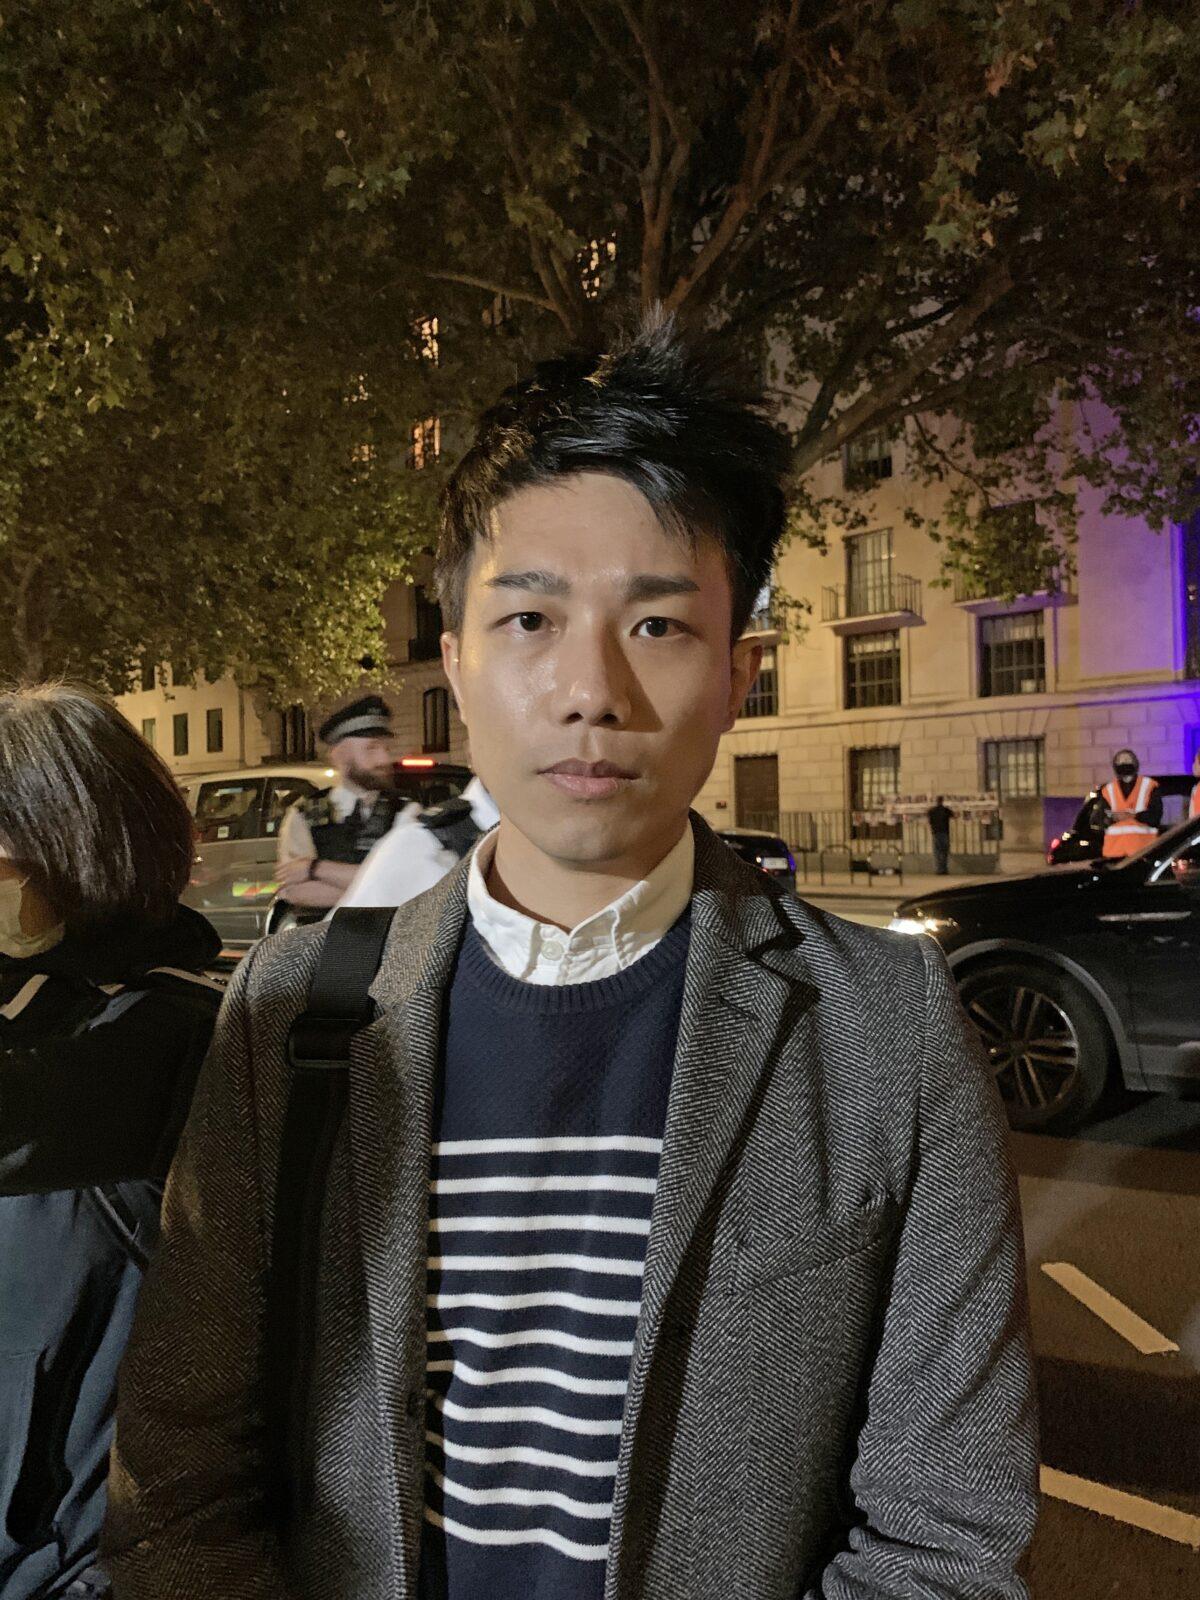 Founder of 'Hong Kong Liberty' Mr. Finn Lau